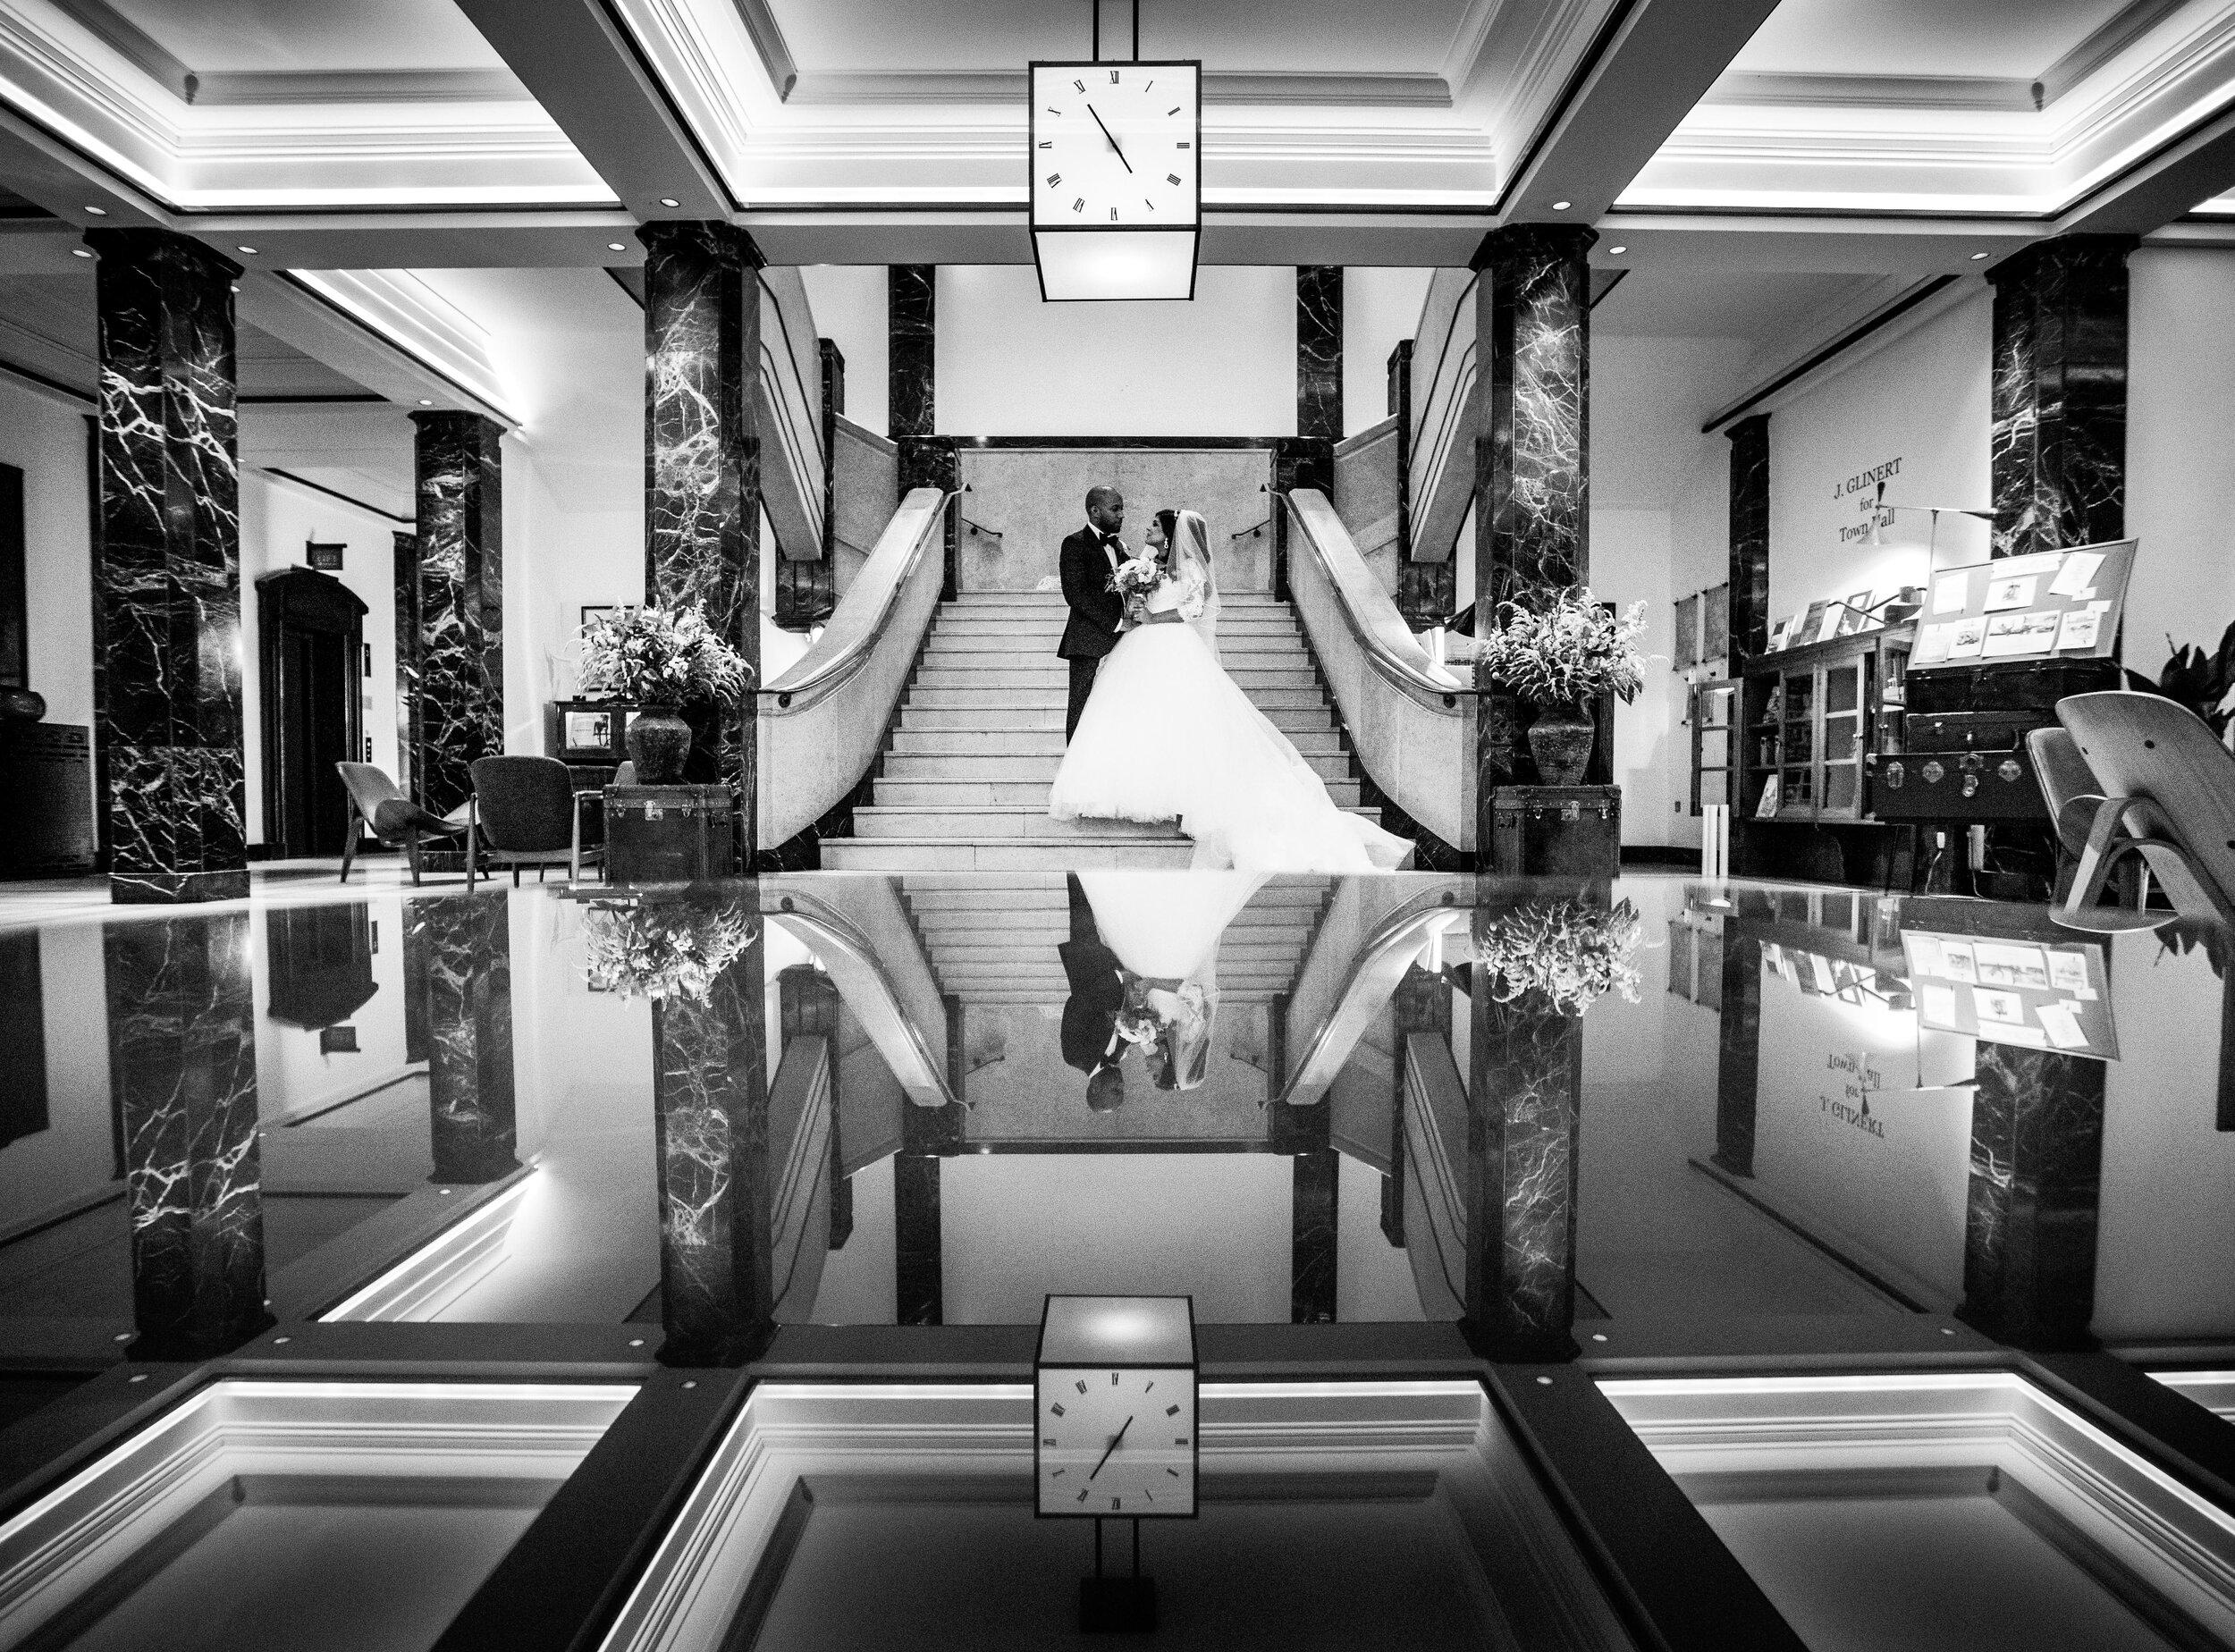 east-london-wedding-photographer-videographer-patriot-square-apartments-63